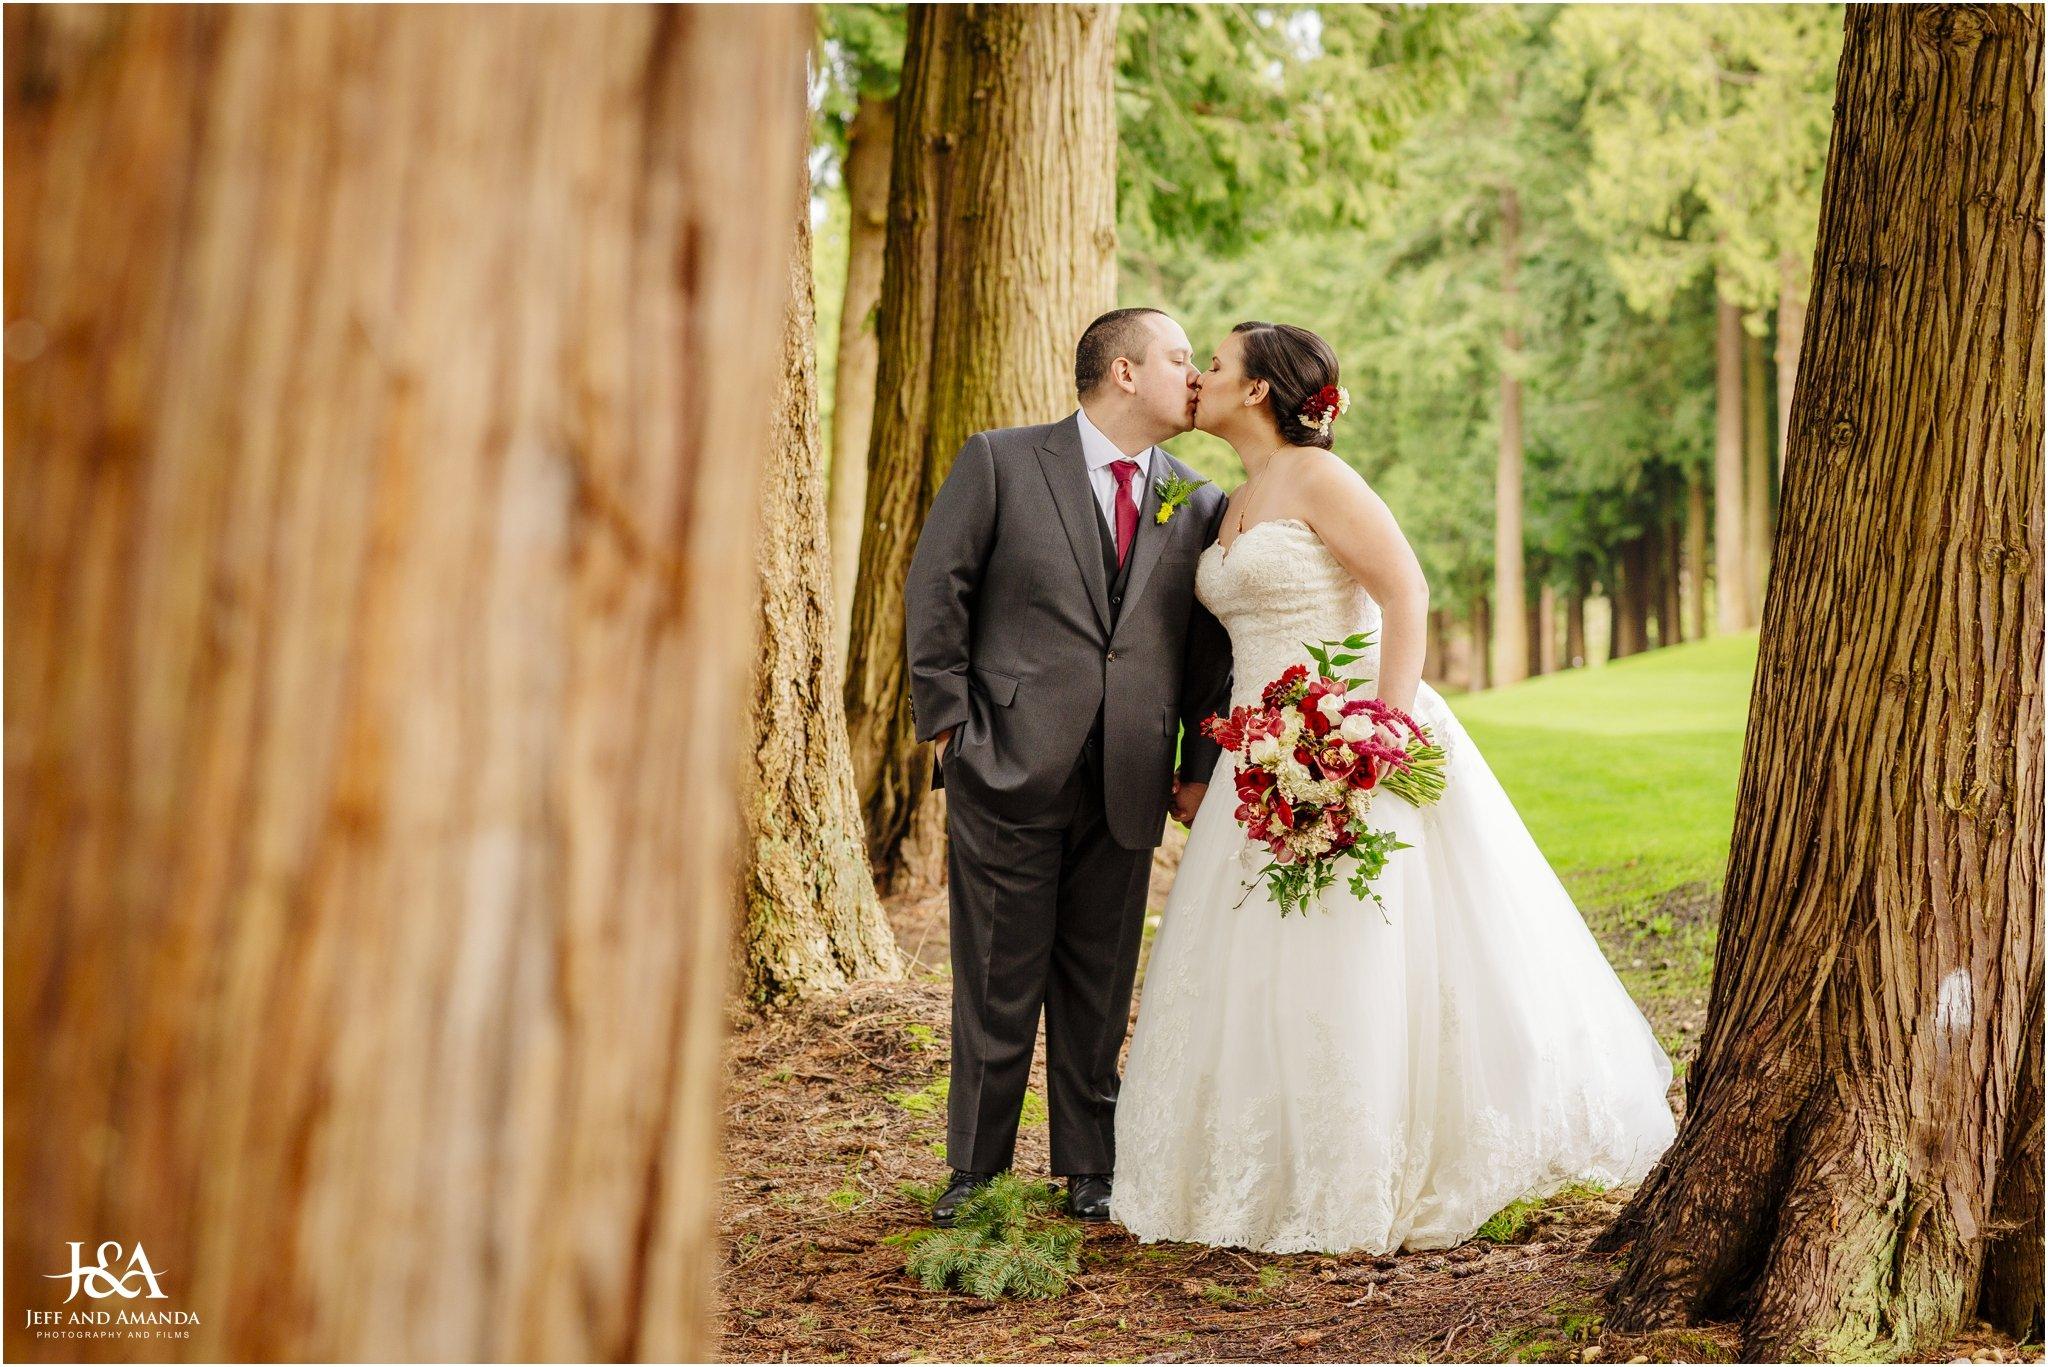 Dave and Kari s Wedding-Facebook Ready-0133.jpg